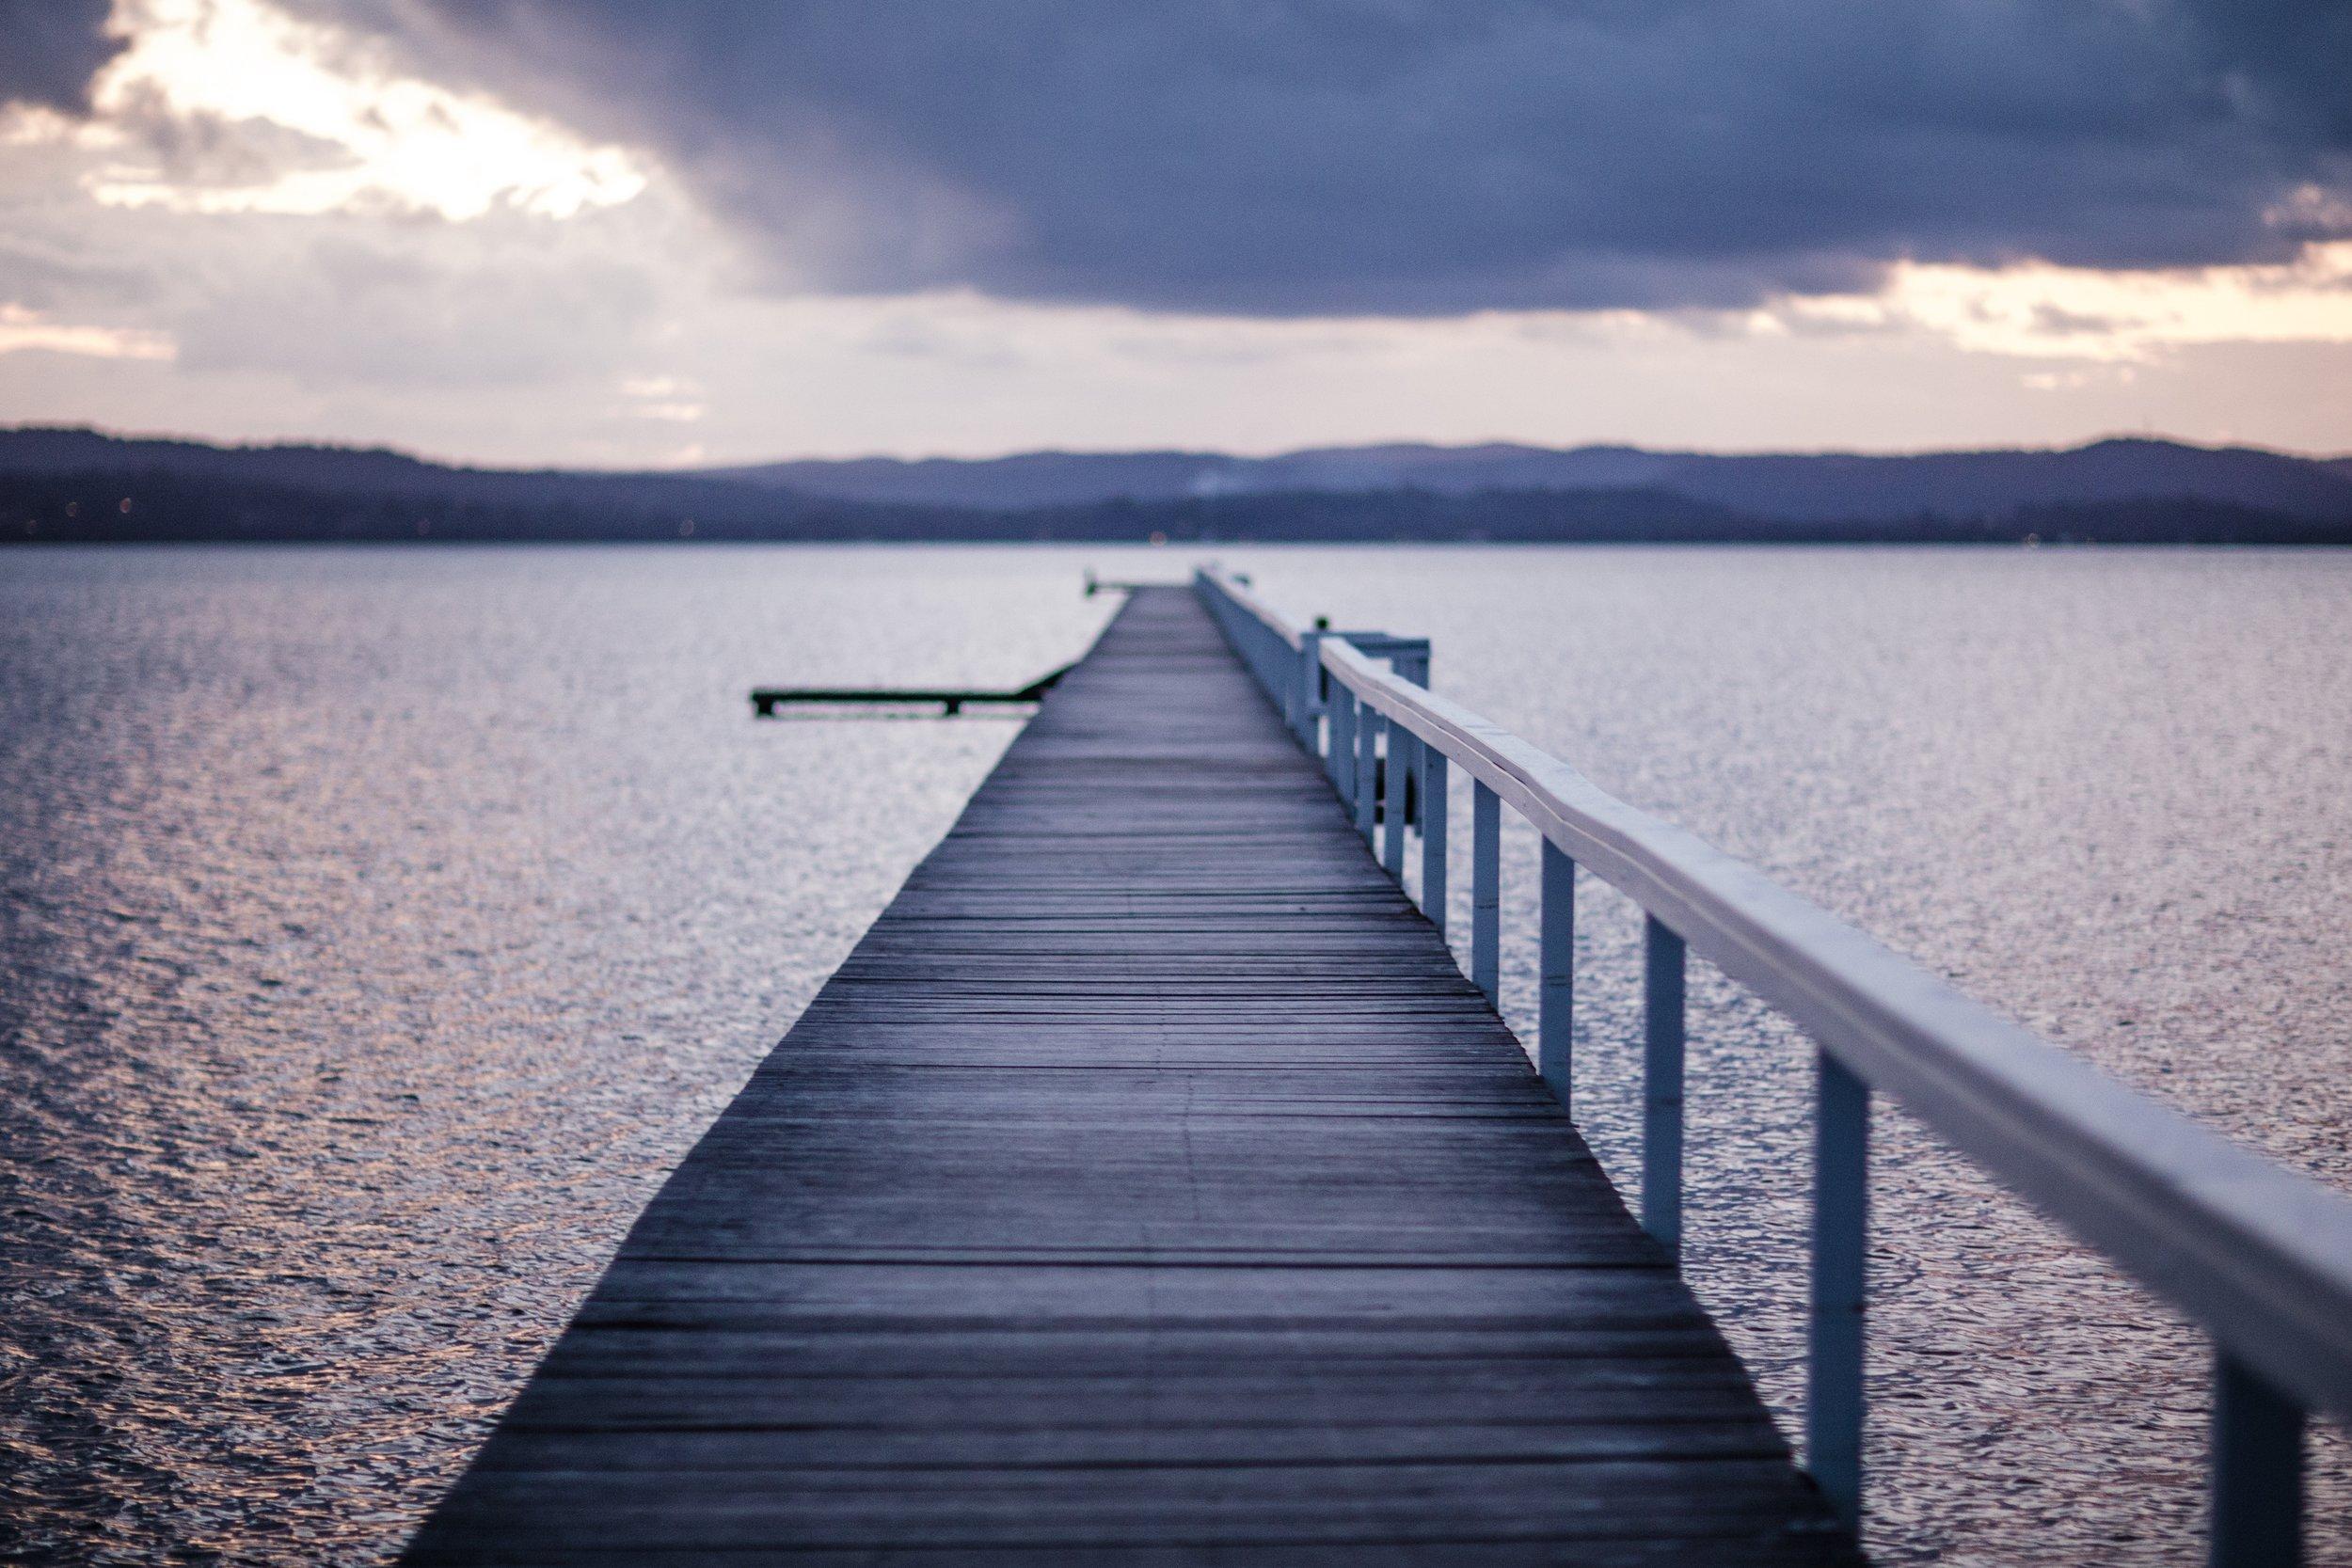 brandon-matich lake jetty.jpg